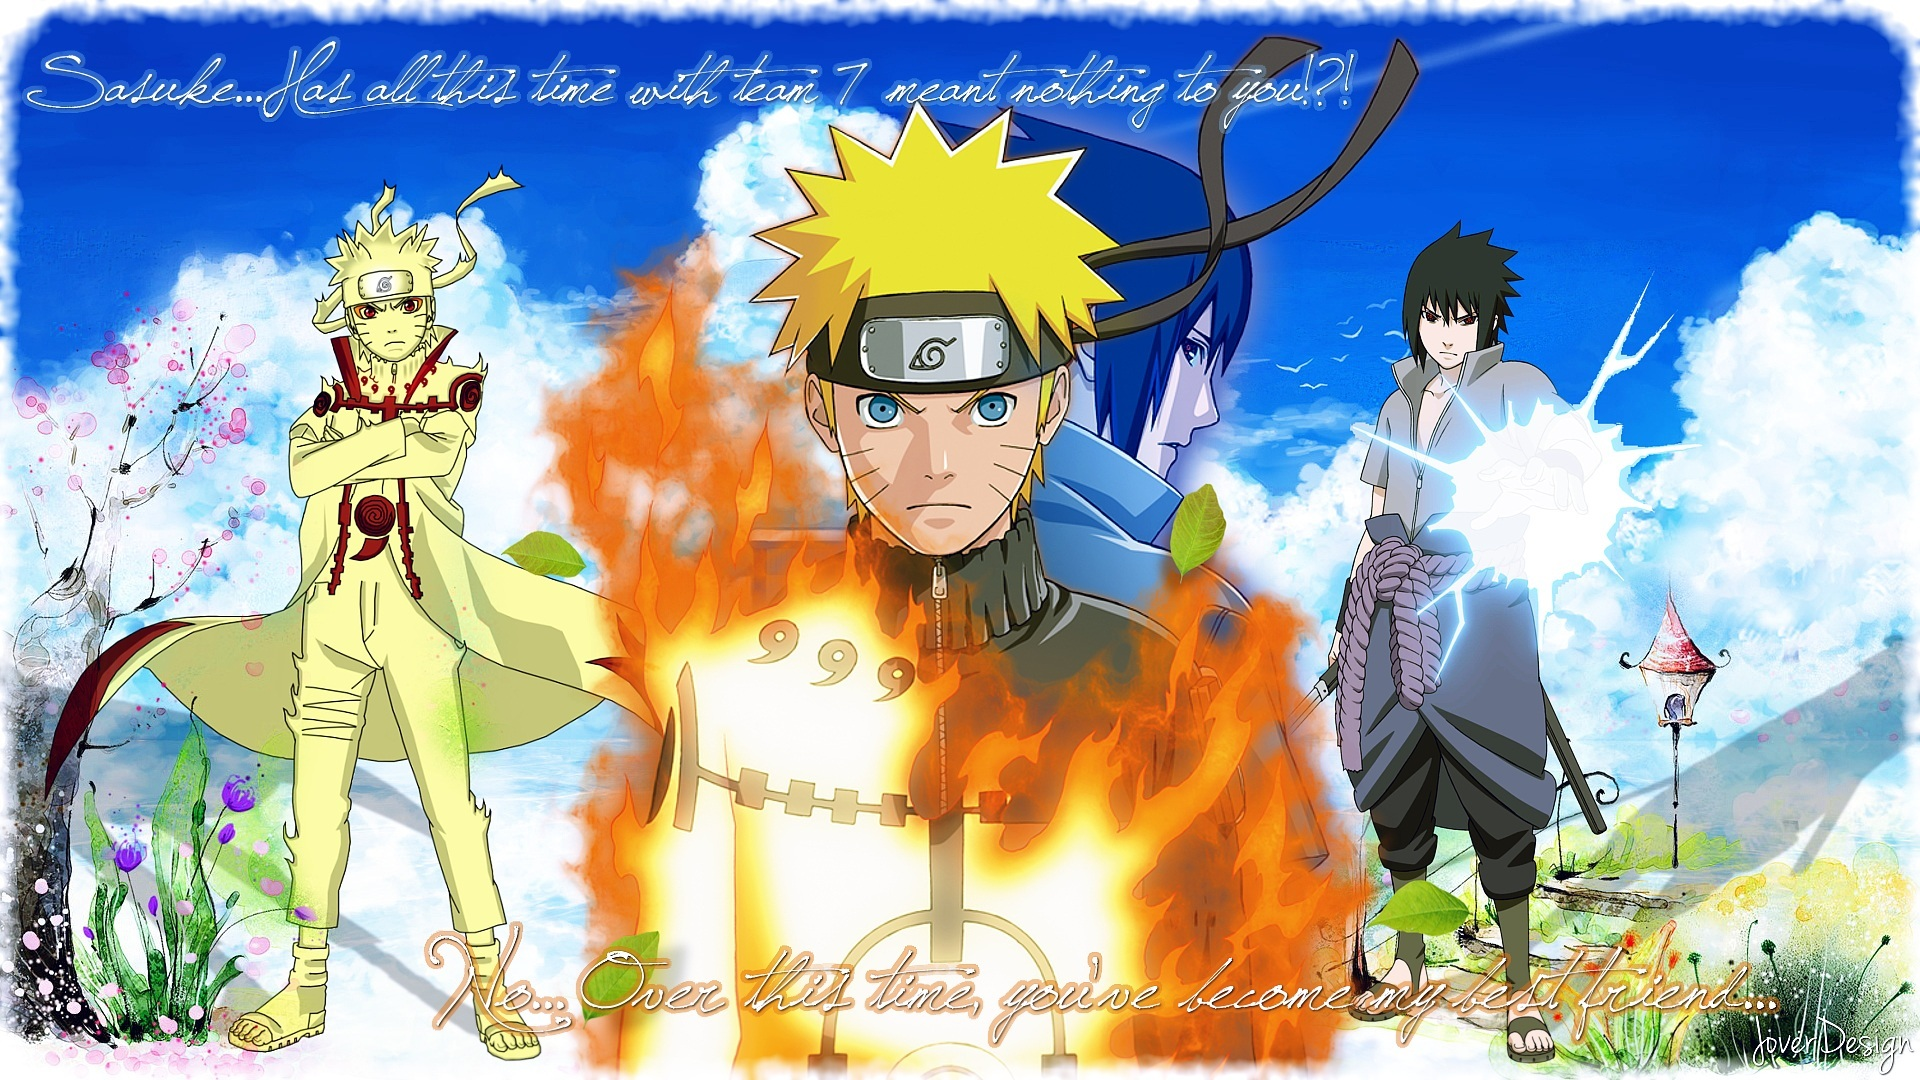 Fantastic Wallpaper Naruto Friend - naruto_x_sasuke_bestfriend_by_jover_design-d5uvov6  Pictures_625220.jpg